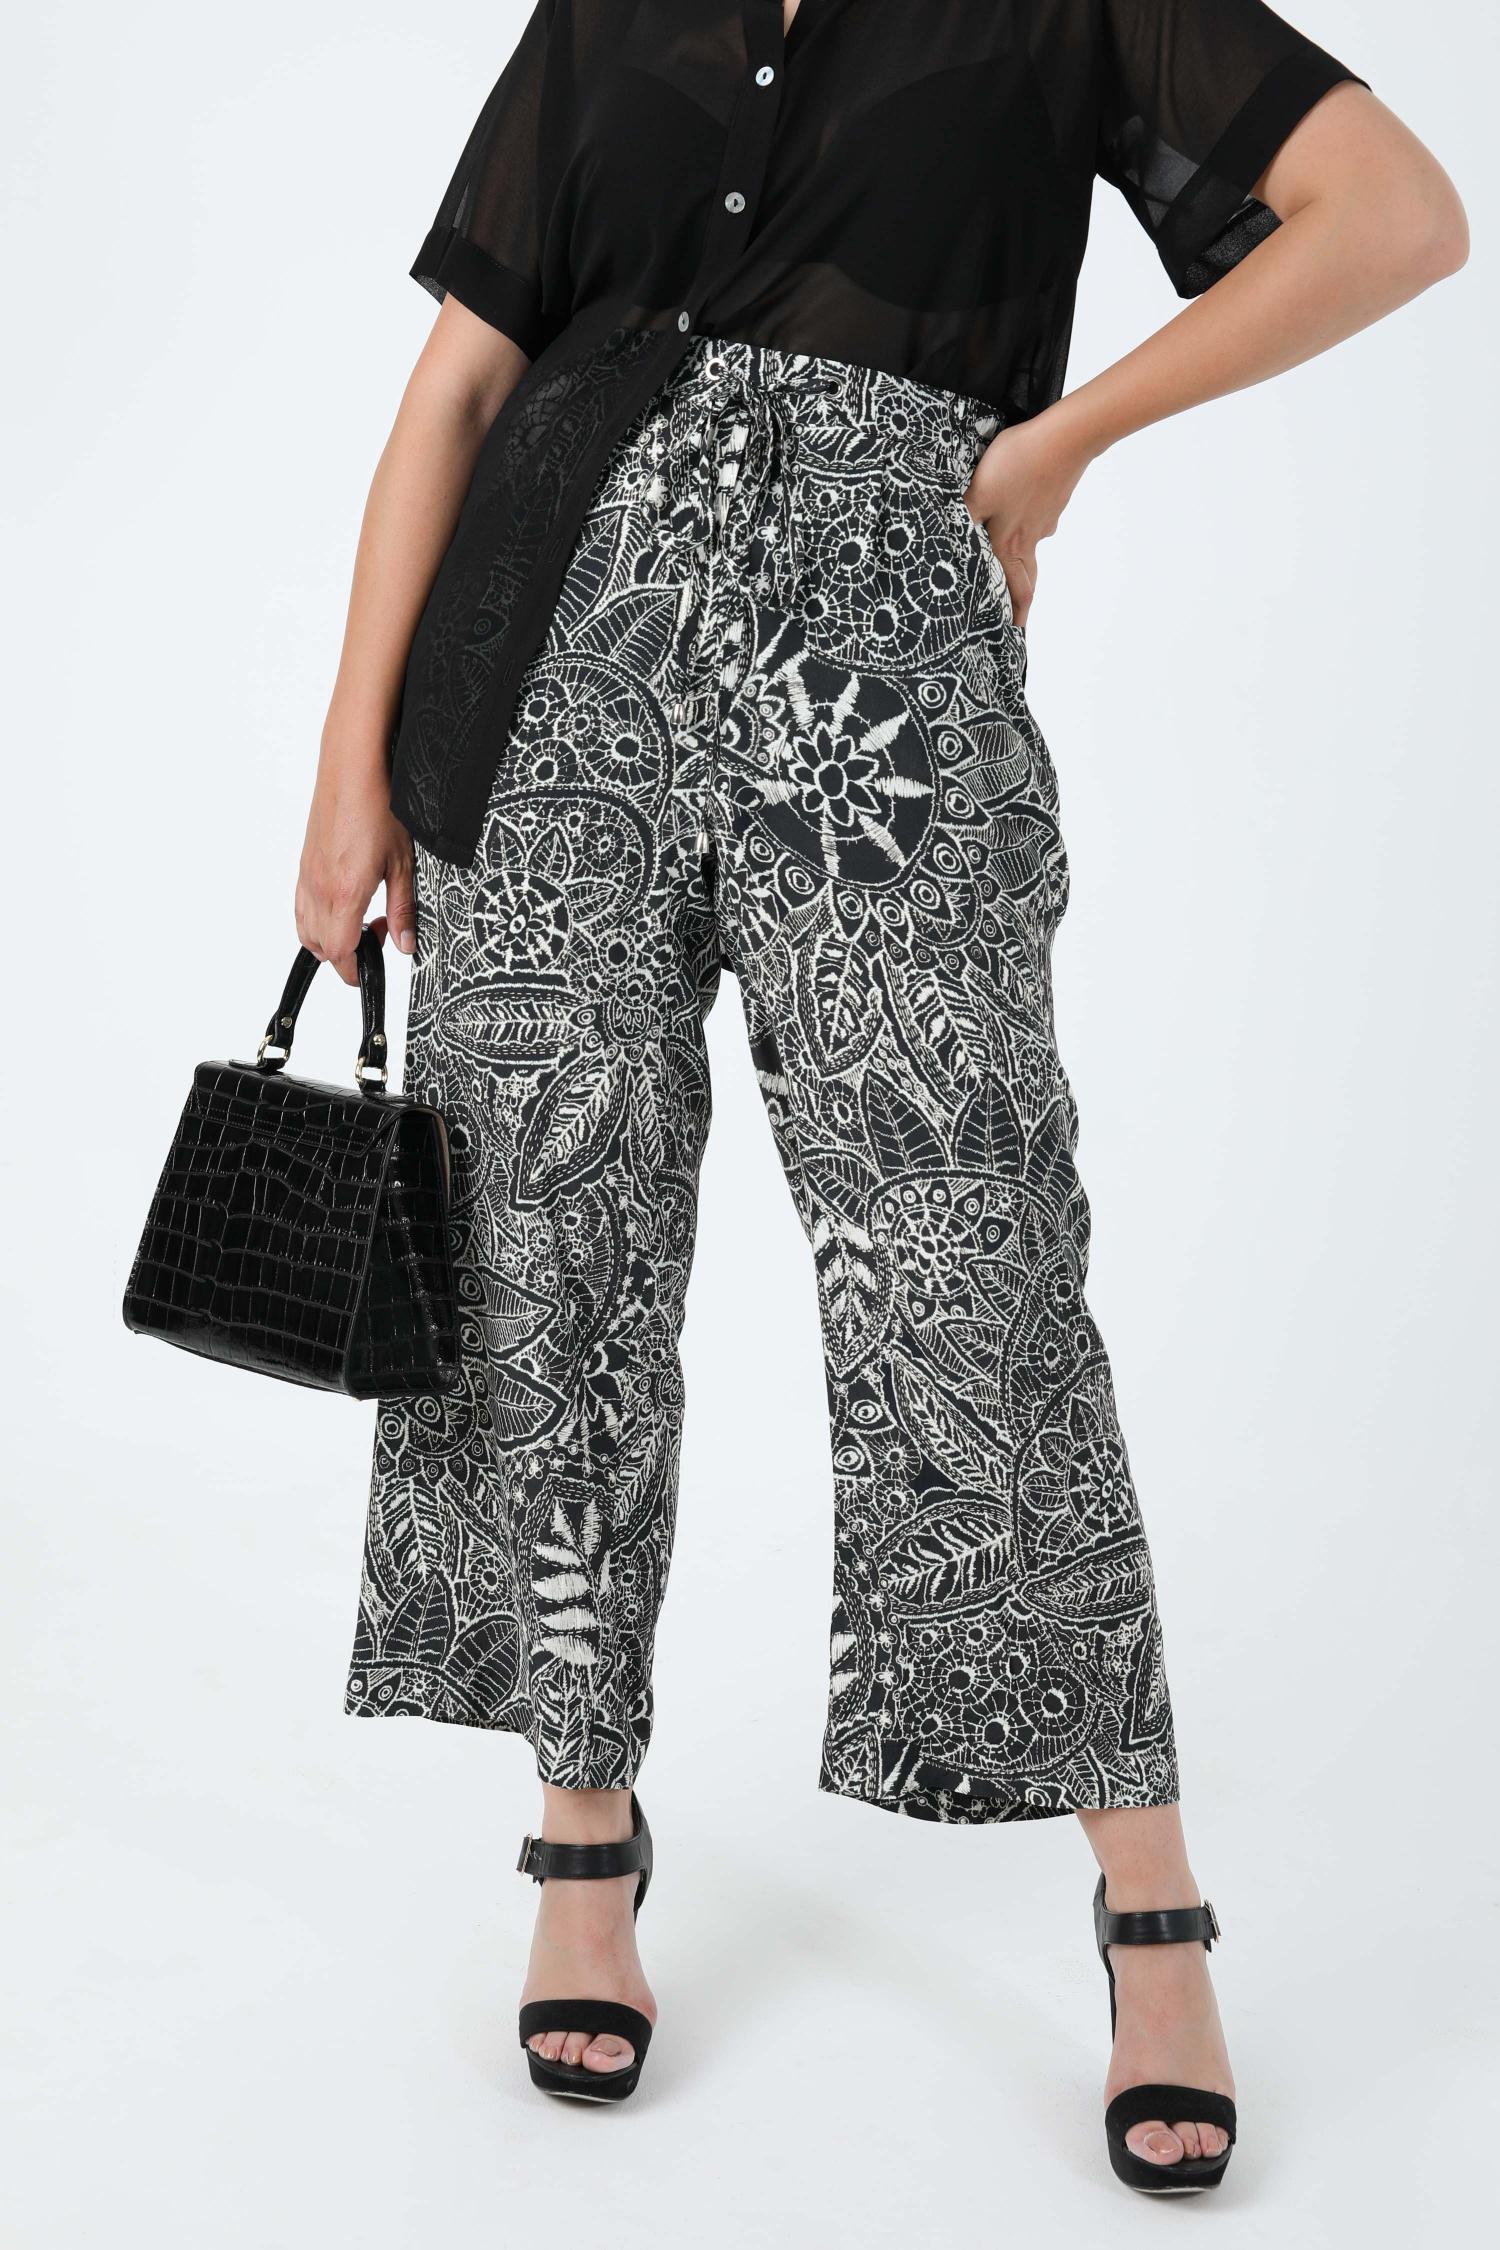 Fluid pants printed in eoko-tex fabric